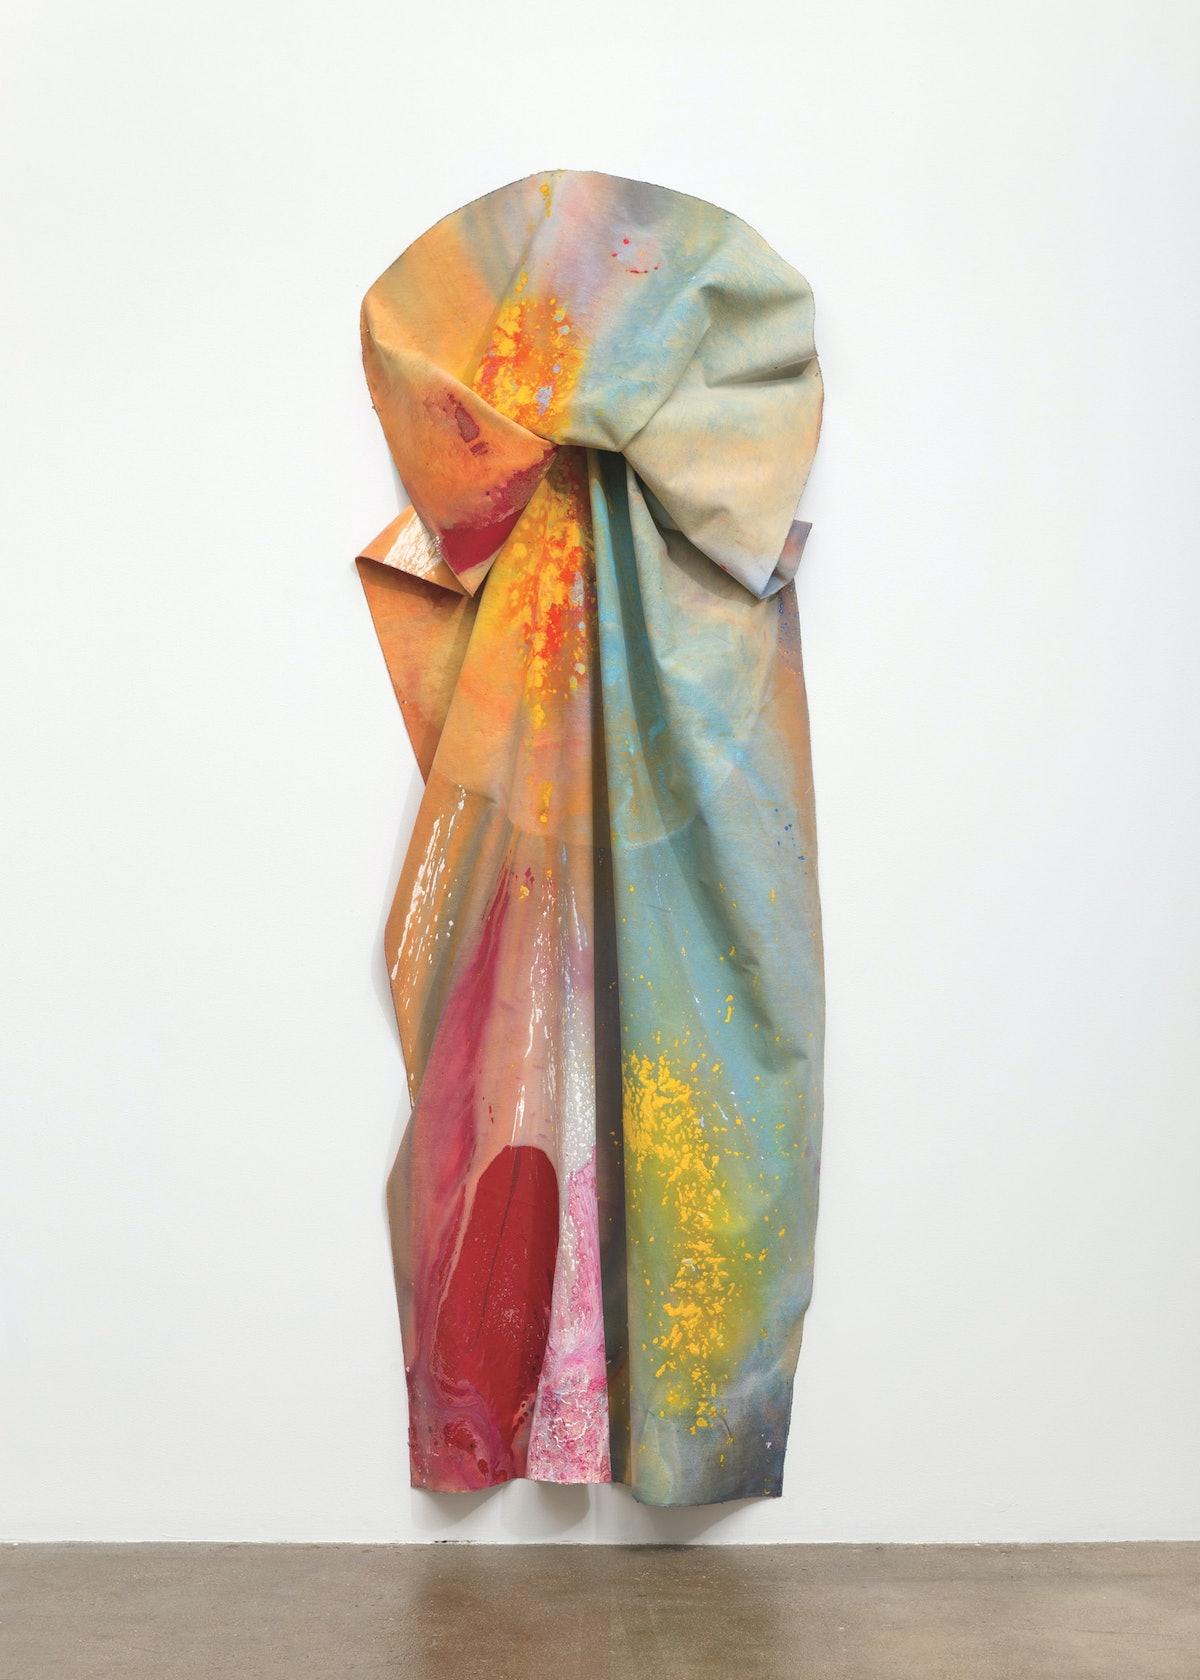 Gilliam's Crystal, 1973